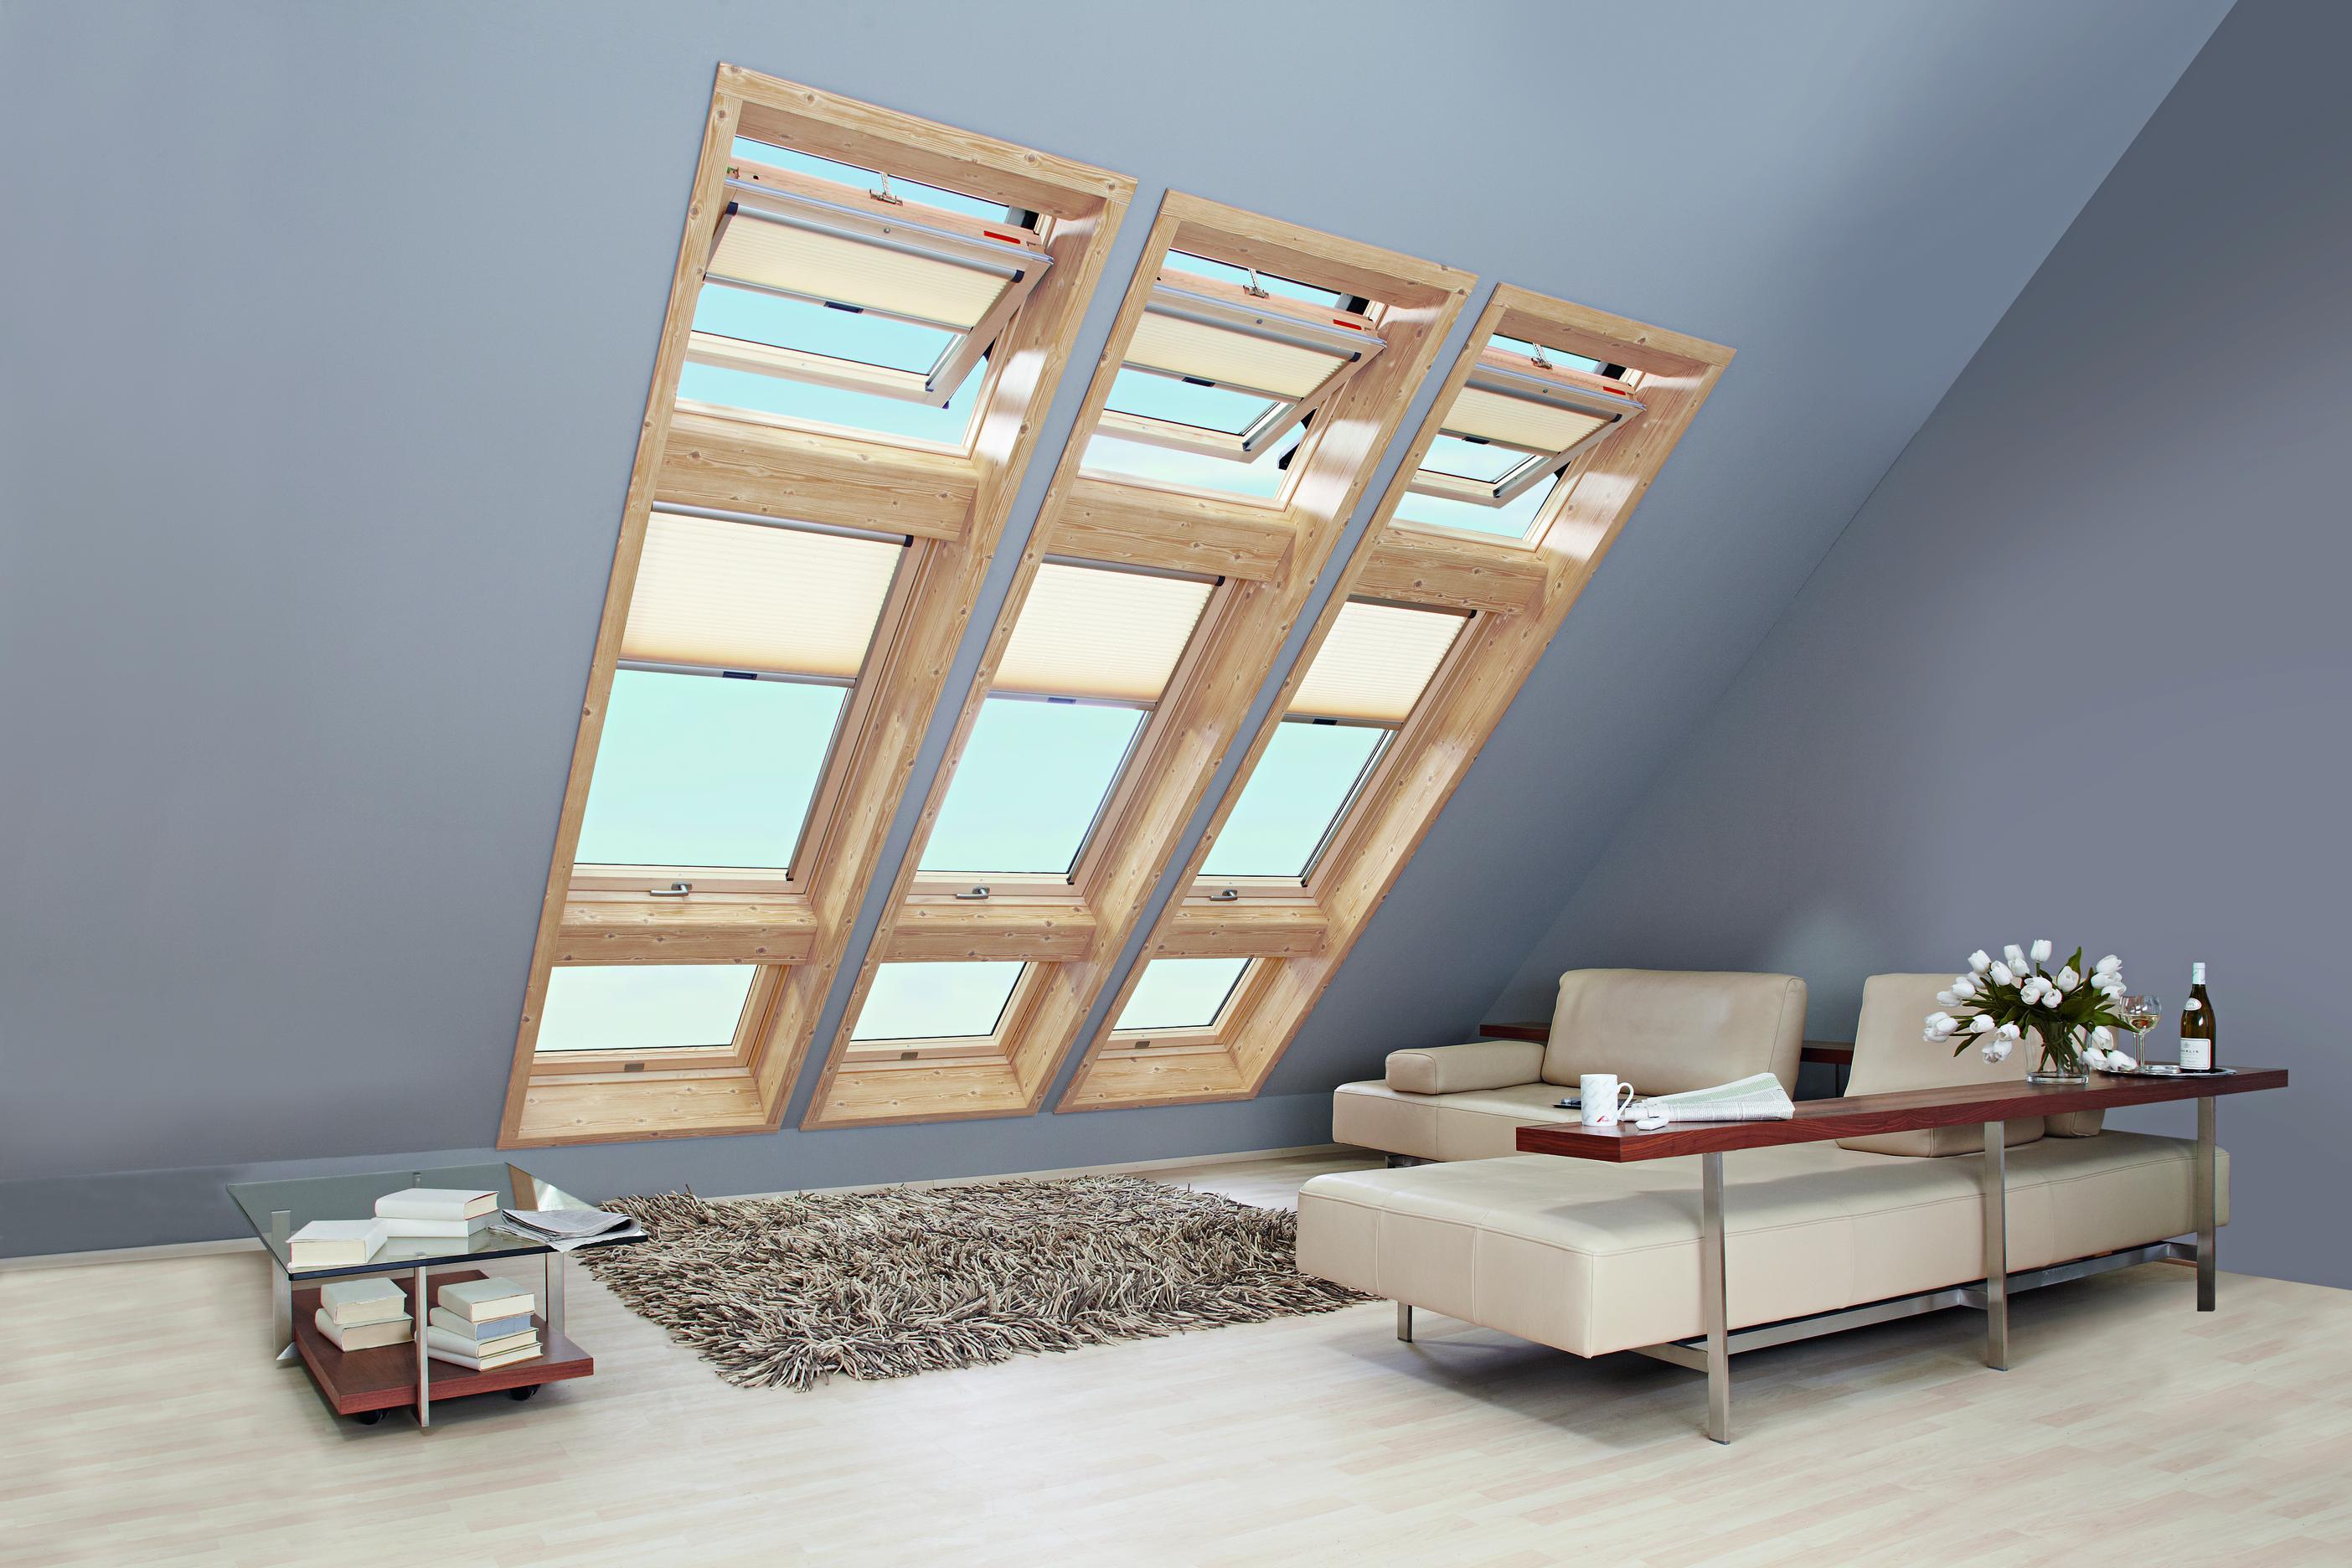 dachfenstertechnik toptec solution. Black Bedroom Furniture Sets. Home Design Ideas